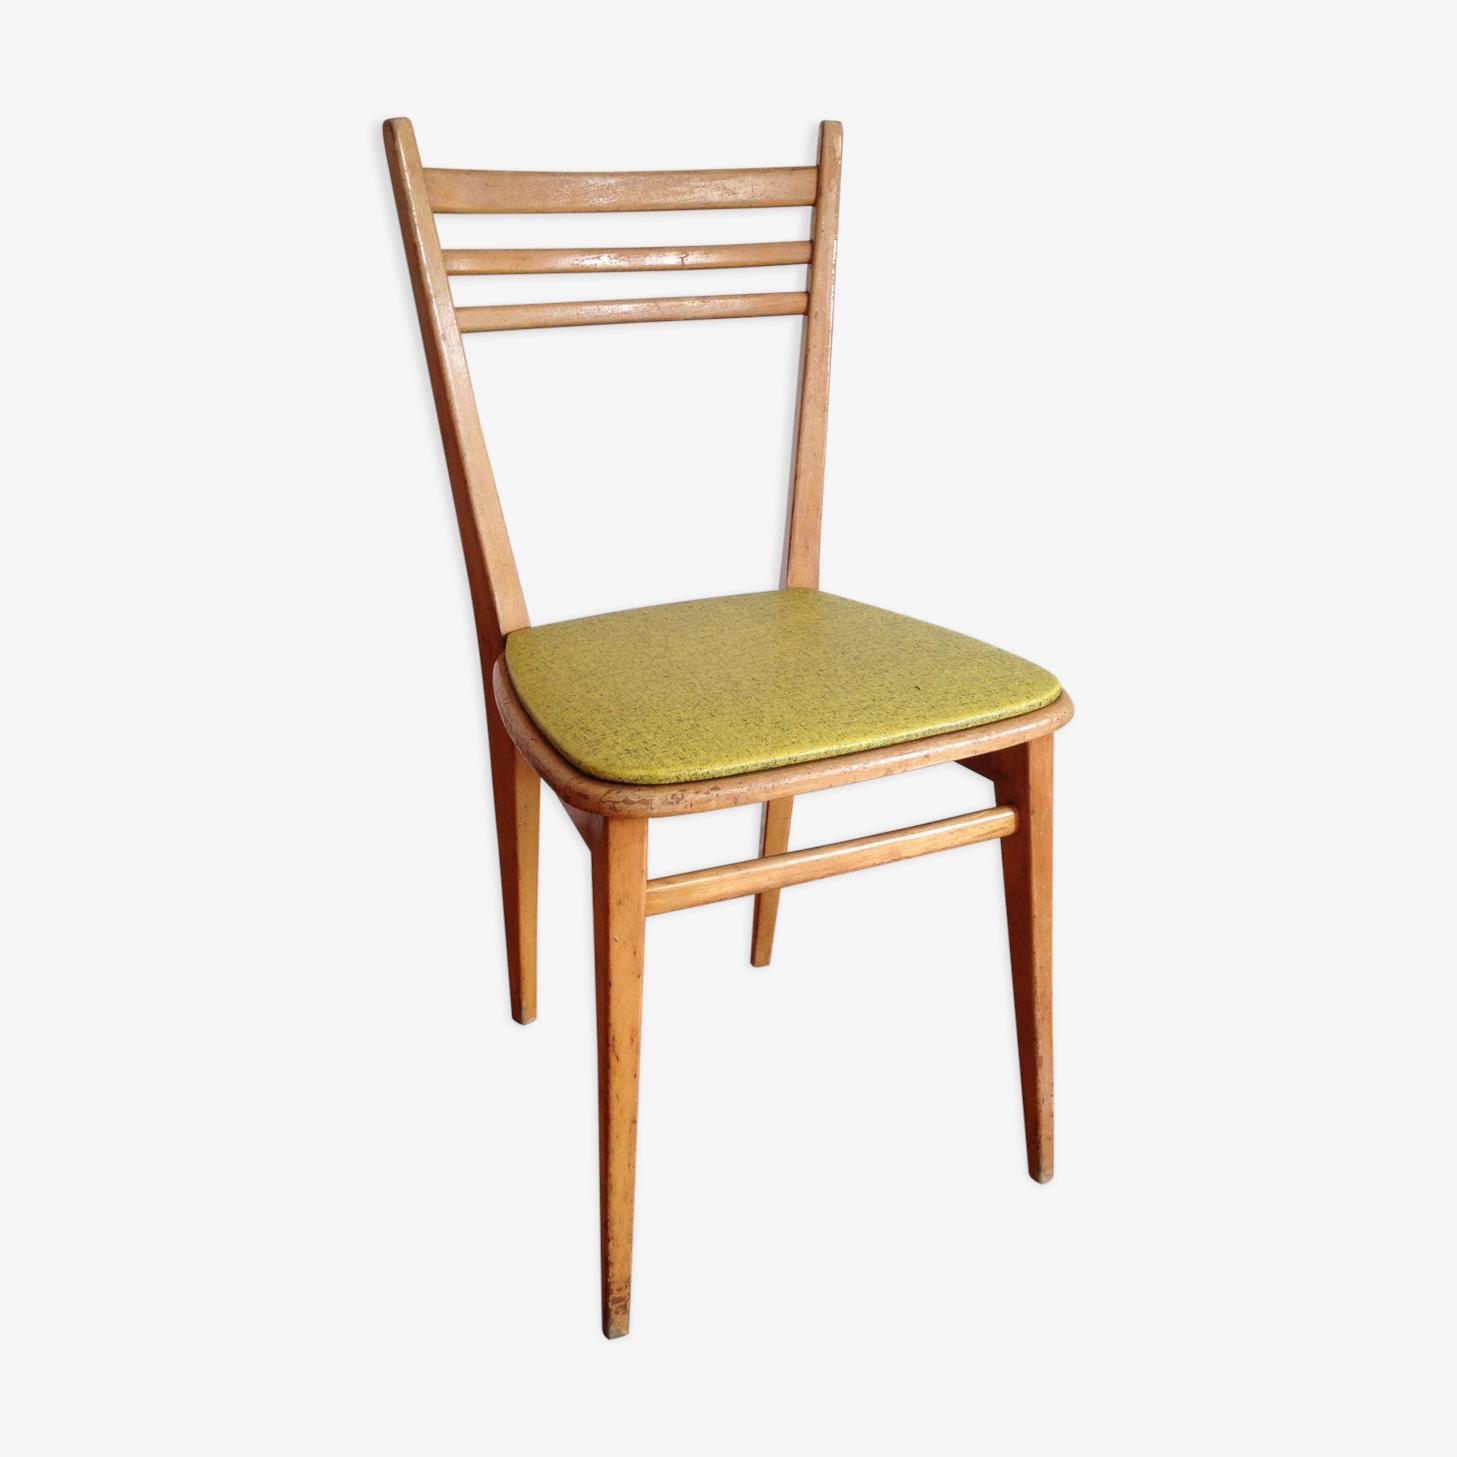 Chaise scandinave bois clair vinyle vert